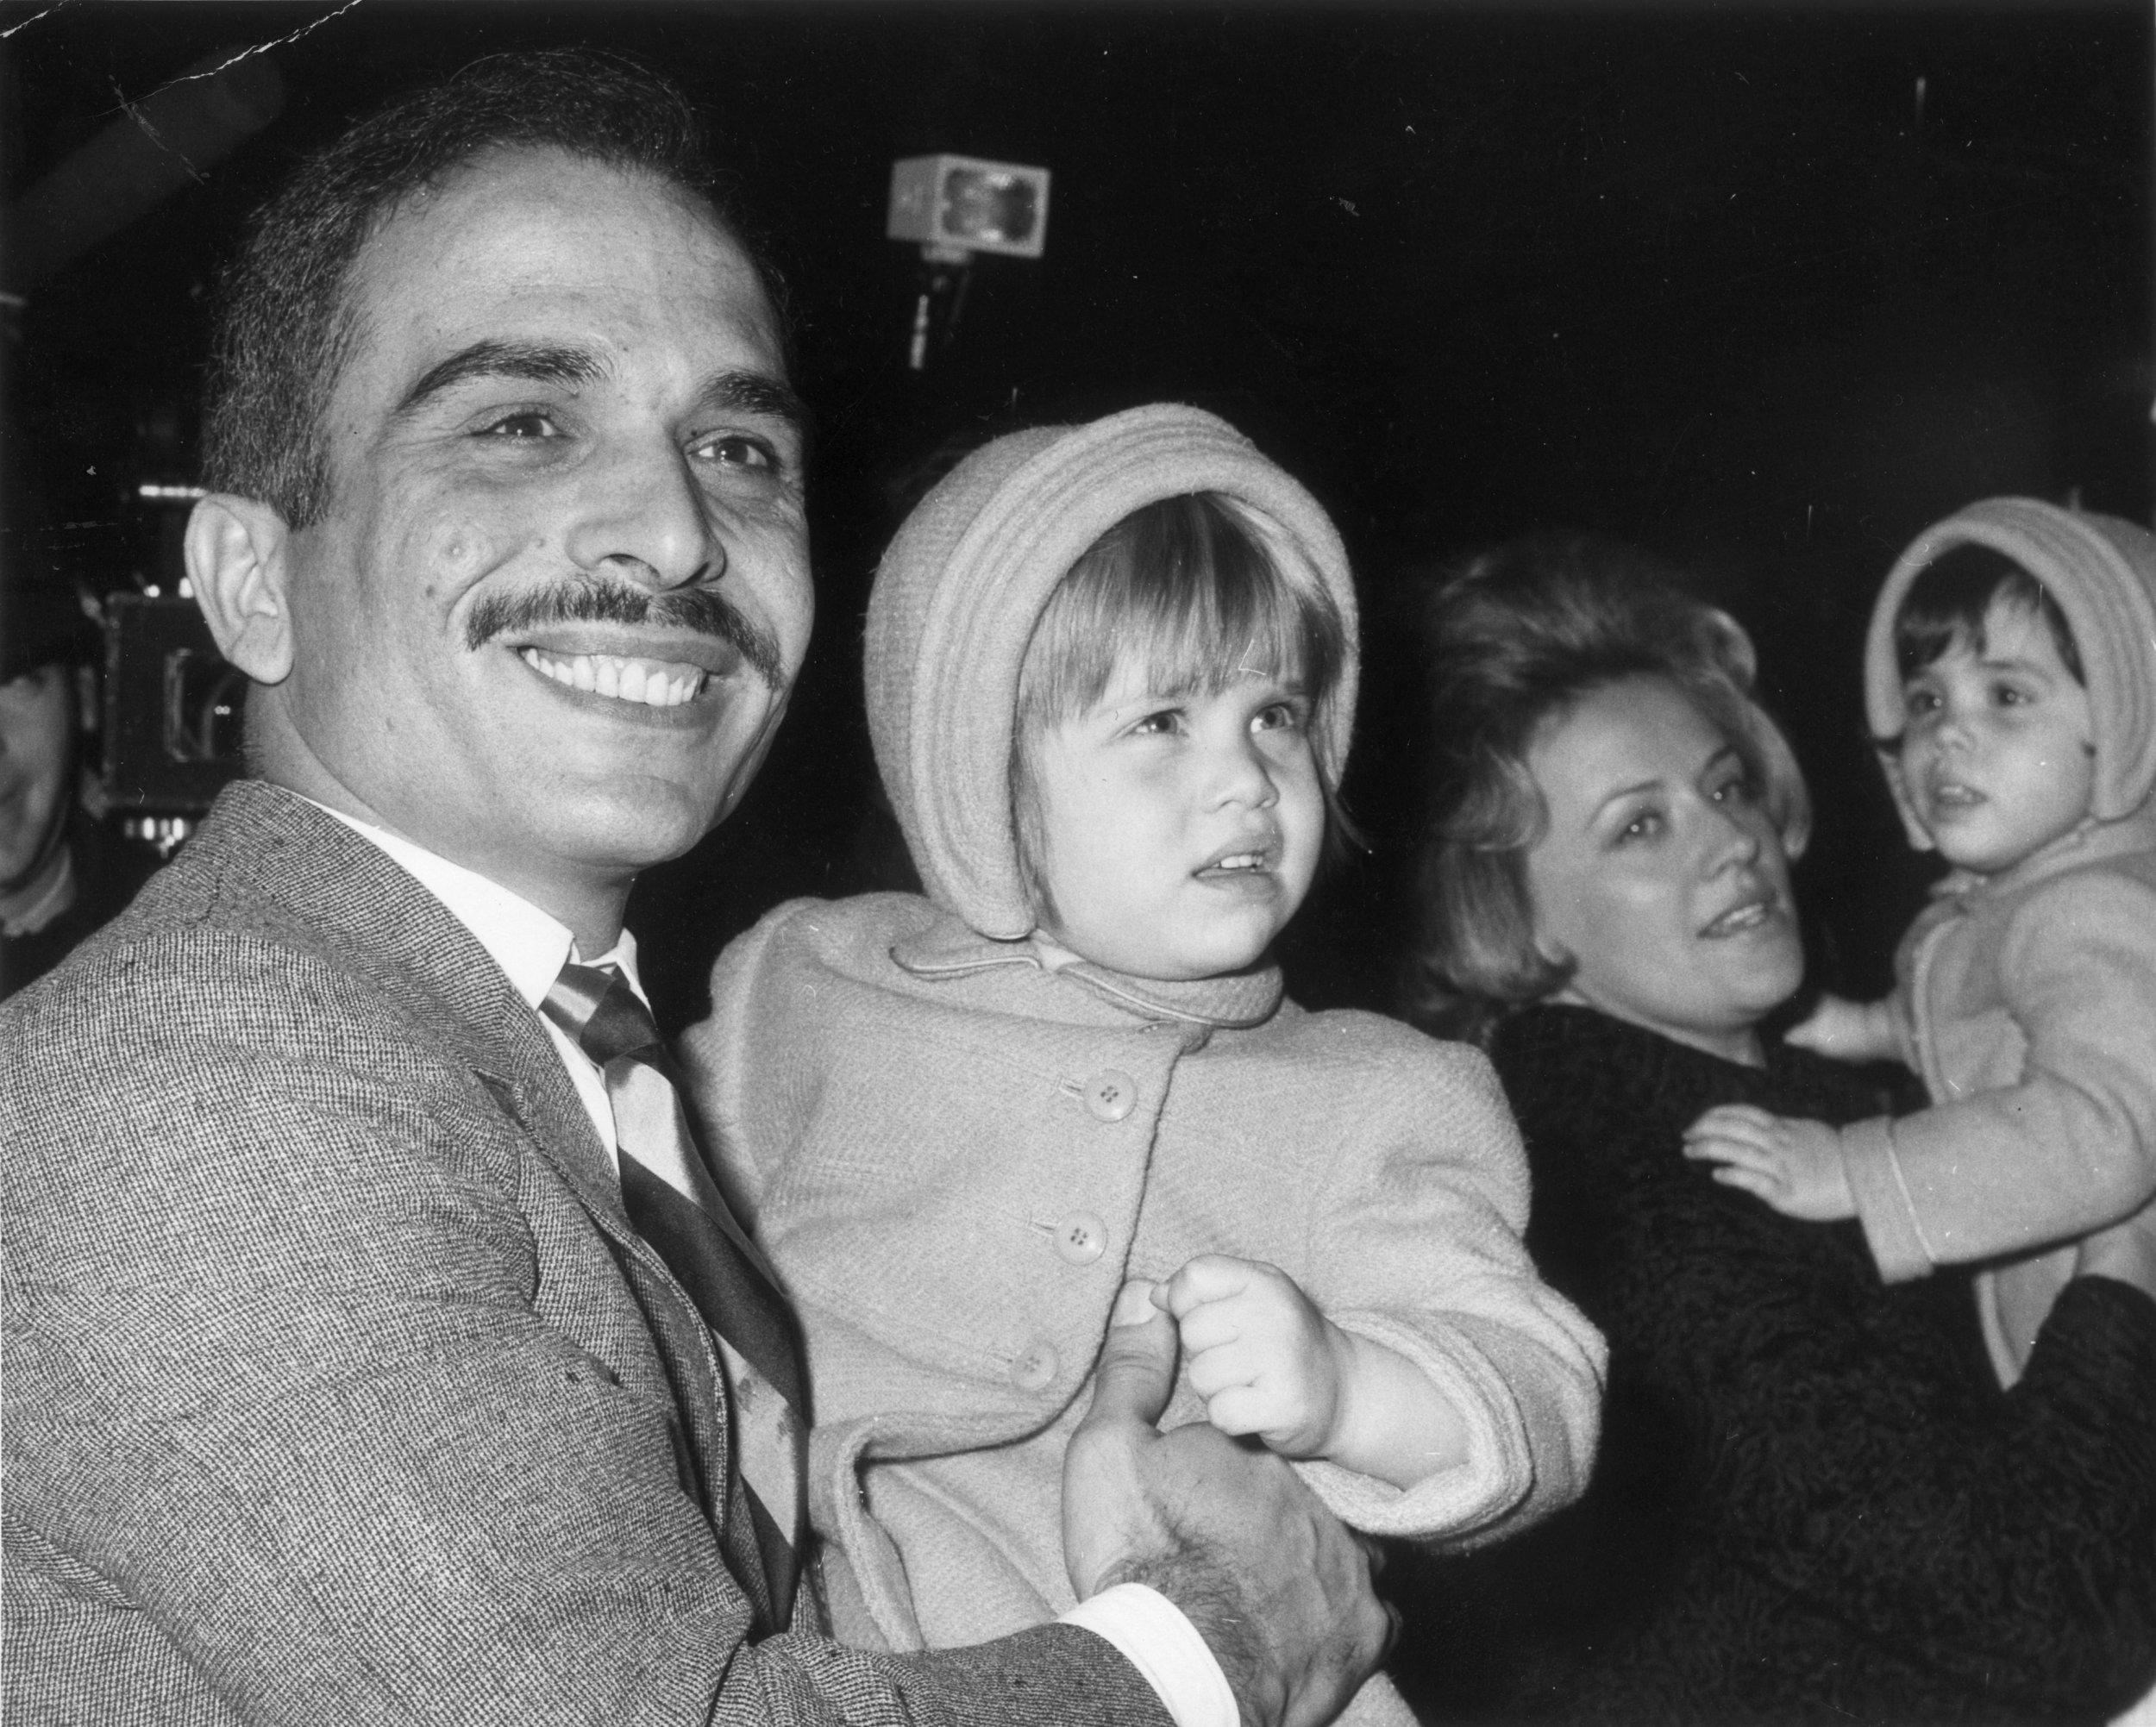 cia files reveal jordan u0026 39 s king hussein may have had child